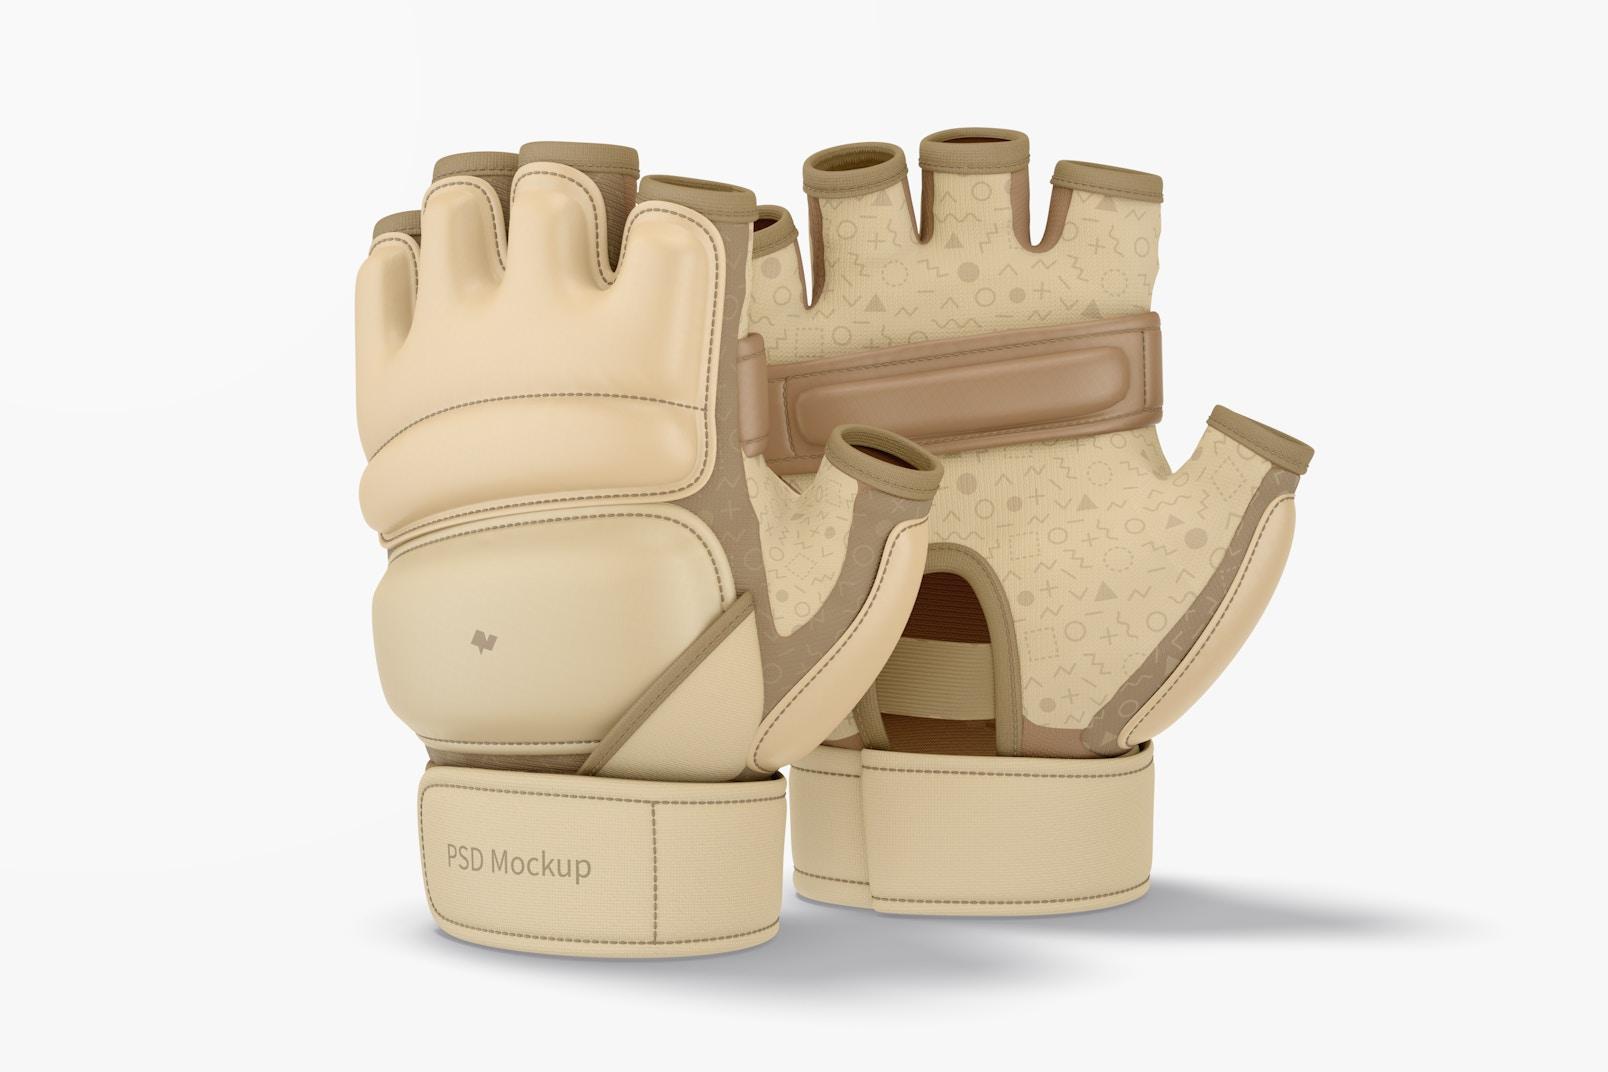 Taekwondo Gloves Mockup, Standing